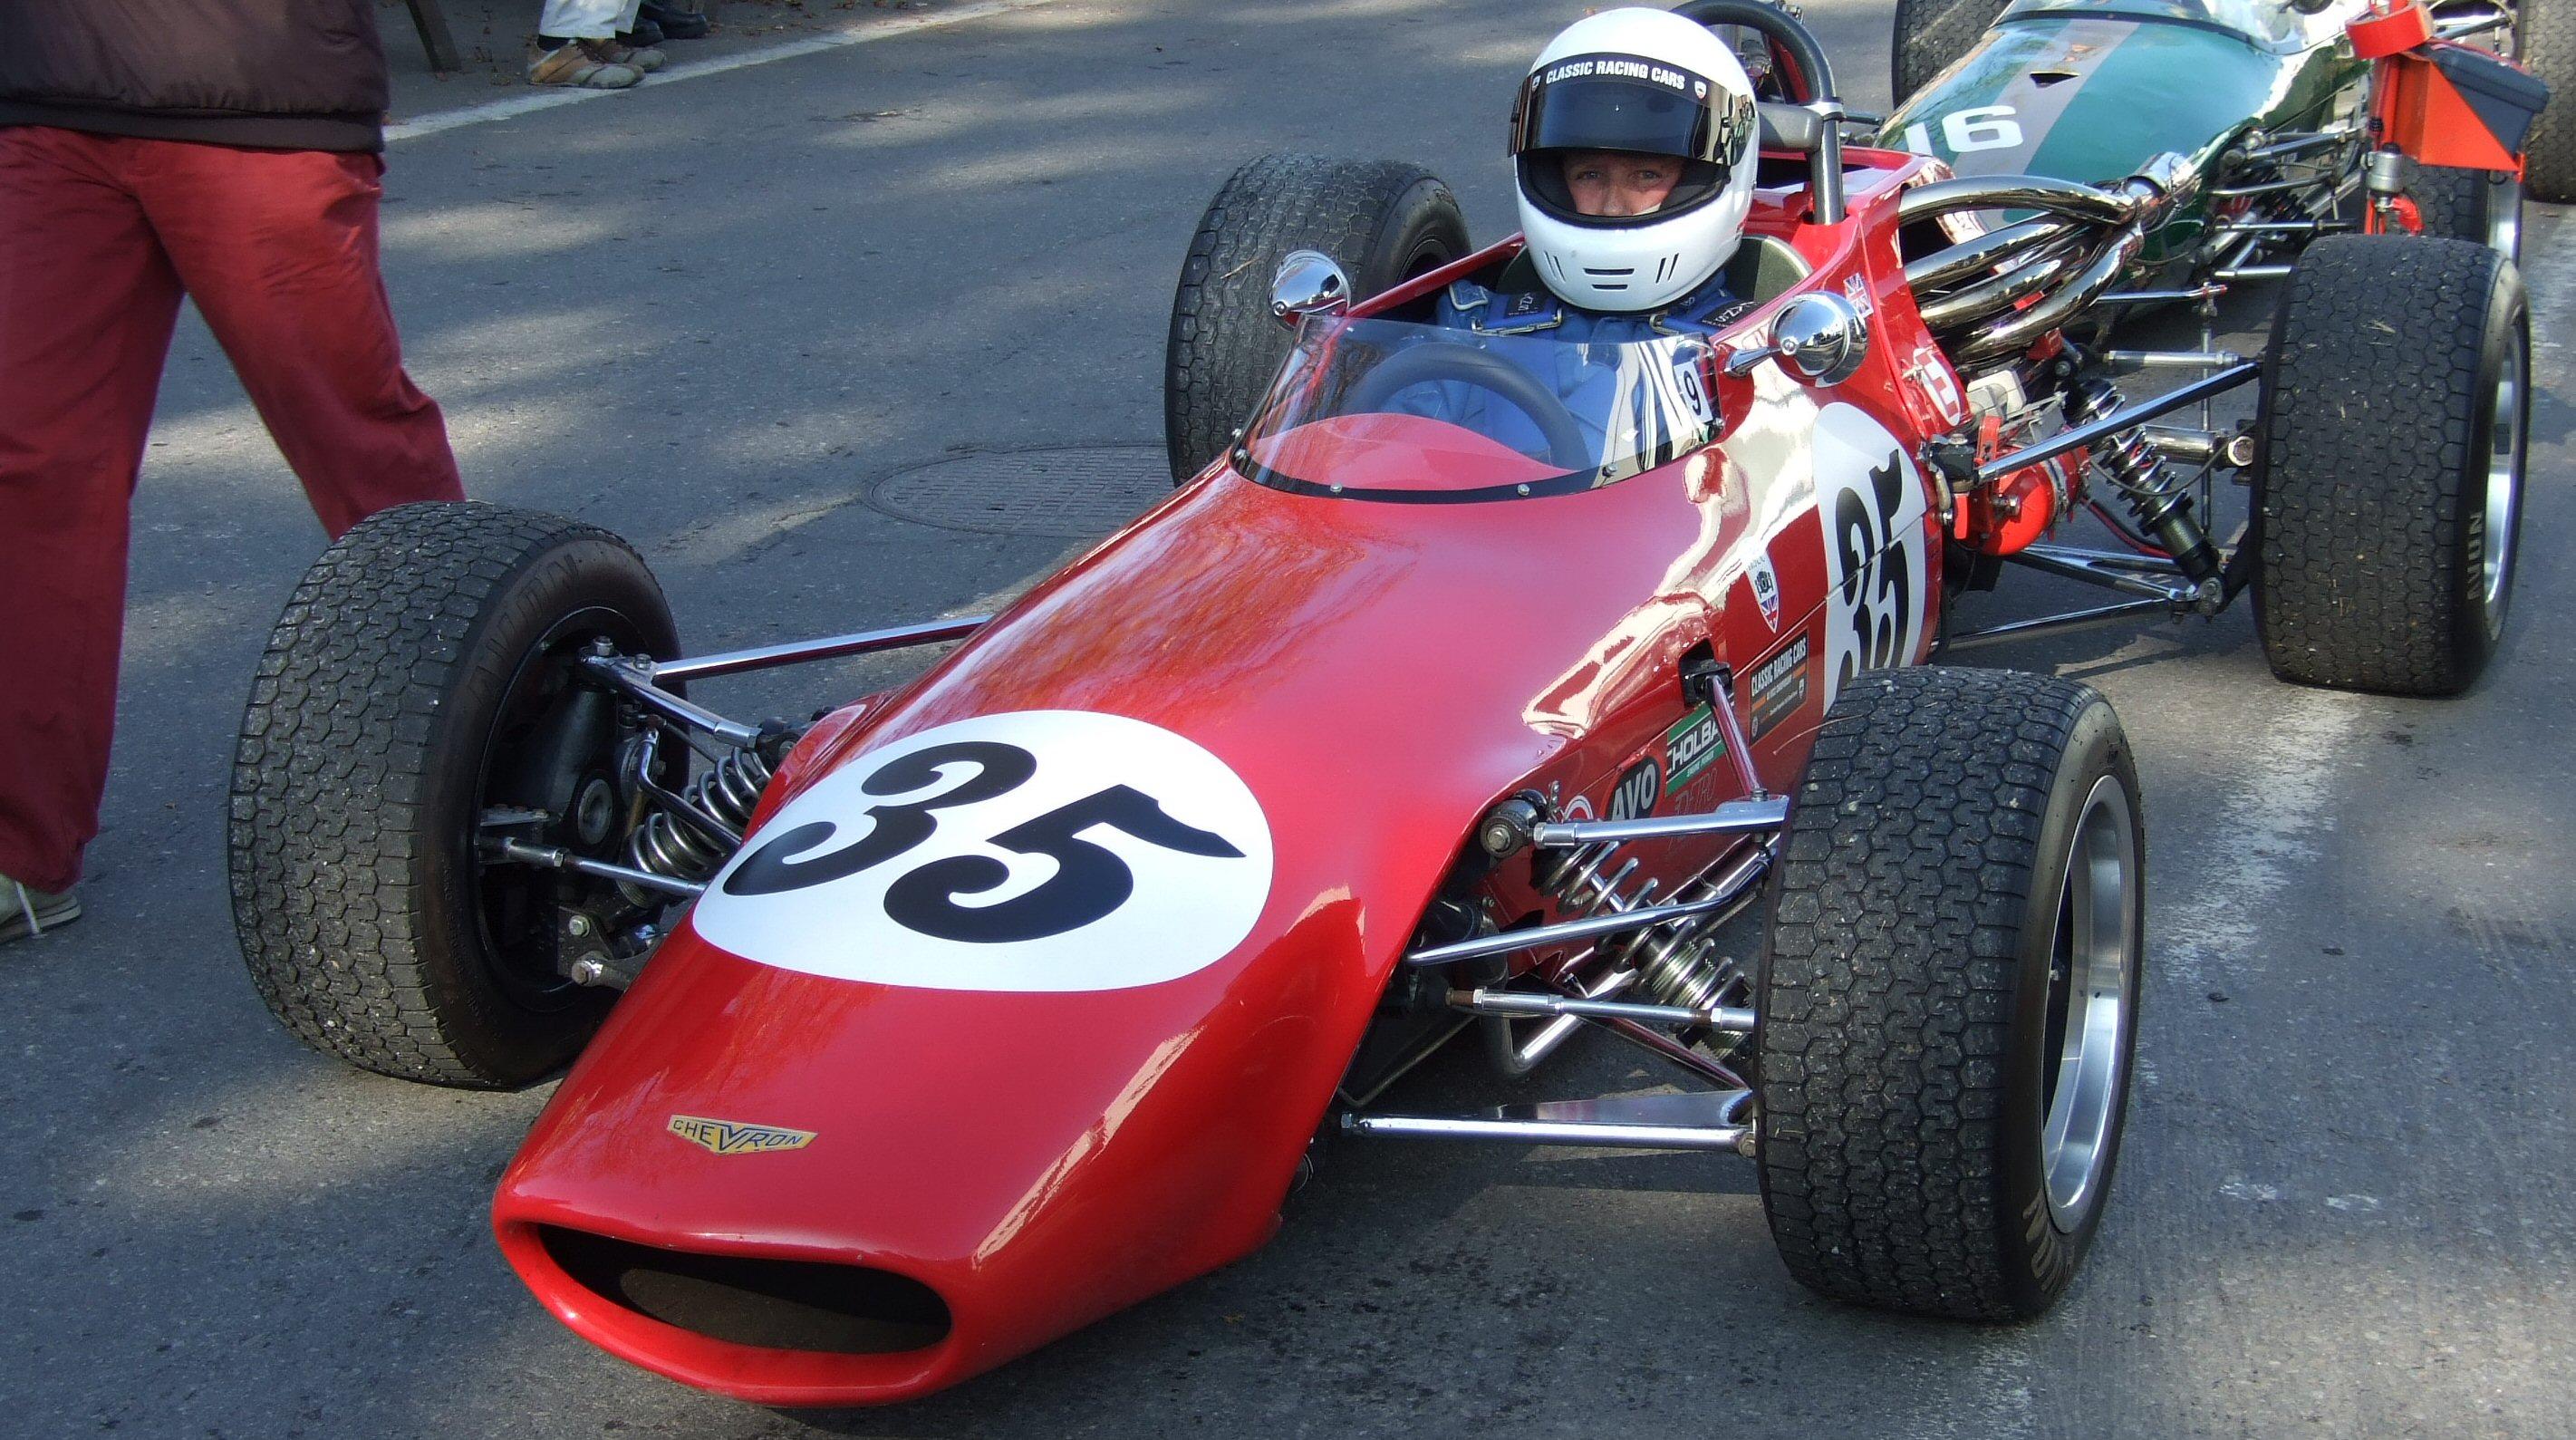 b formula race car for sale classic cars uk pictures. Black Bedroom Furniture Sets. Home Design Ideas